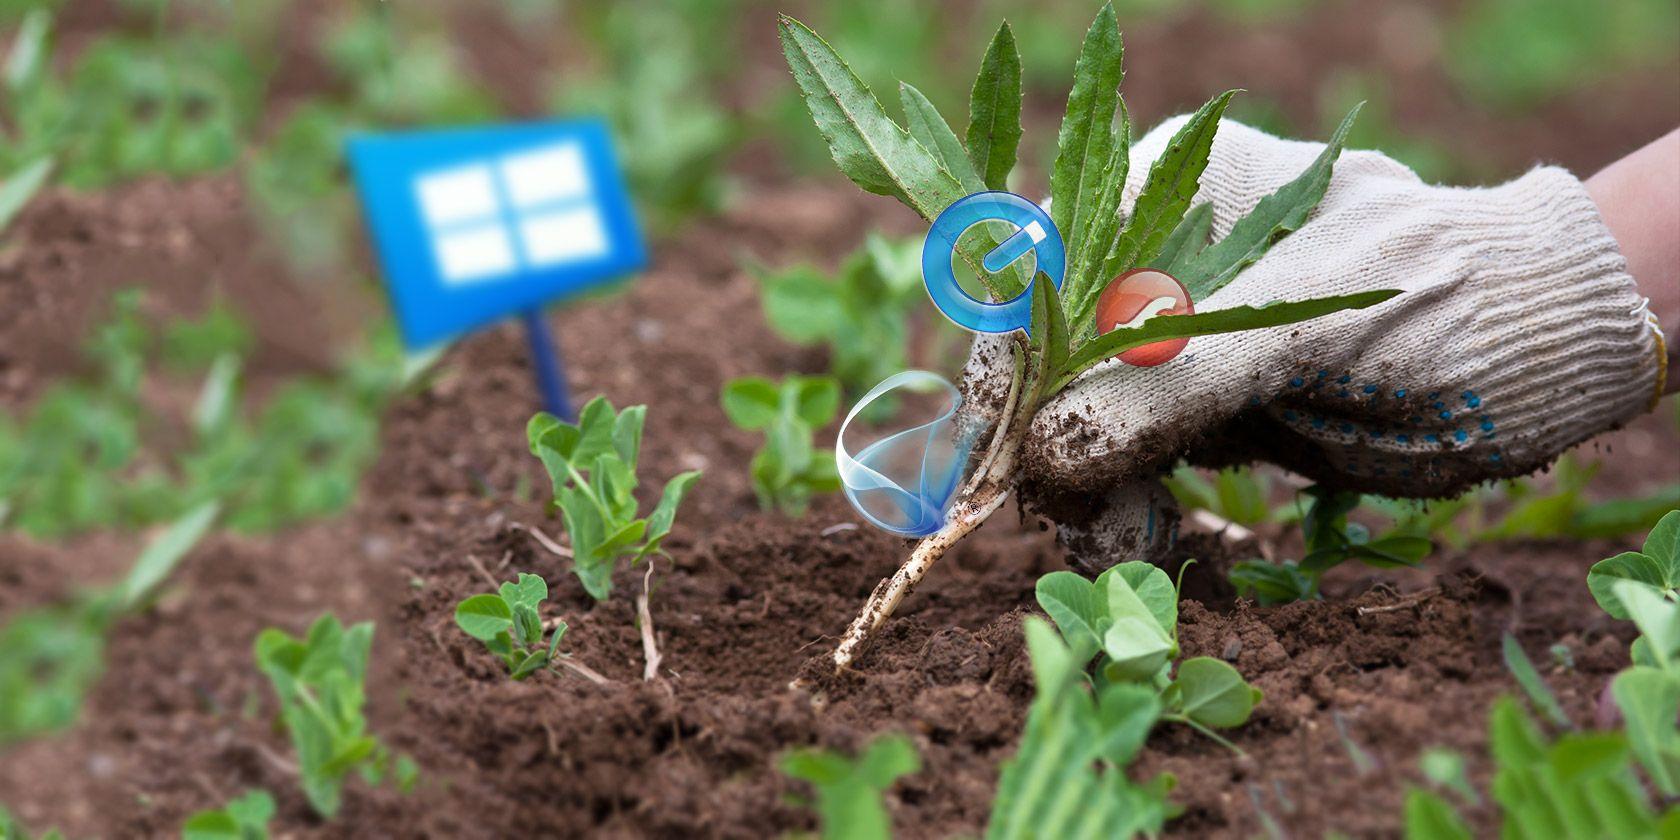 windows-programs-uninstall